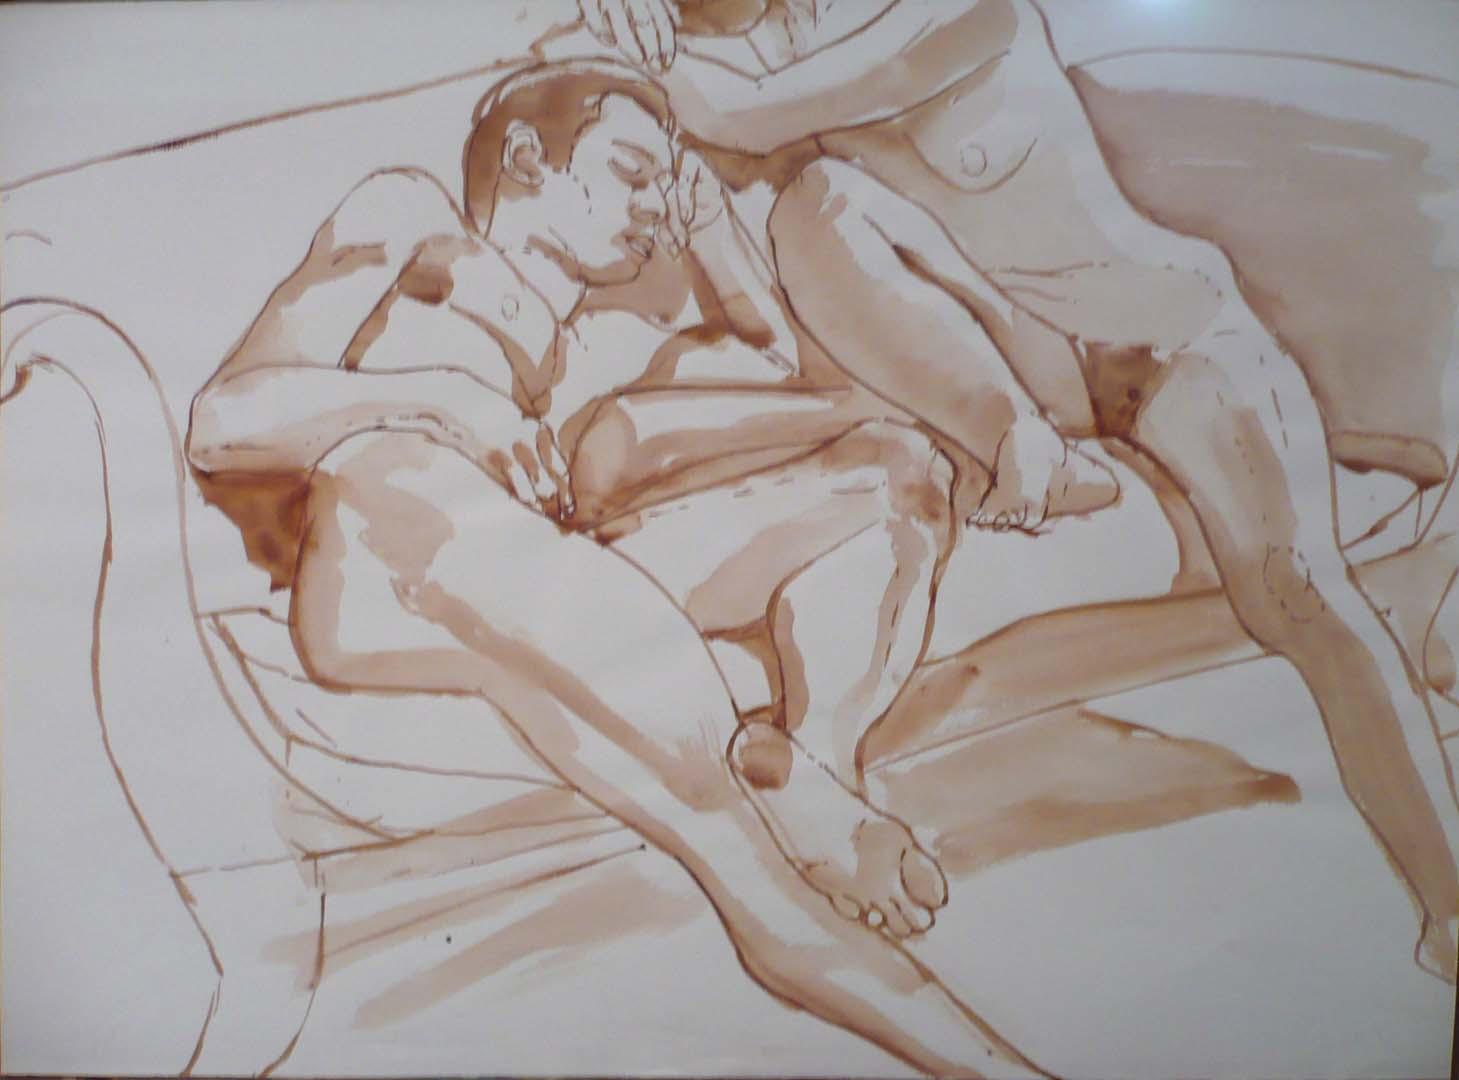 Male Model and Female Model Seated on Sofa Sepia 14.875 x 20